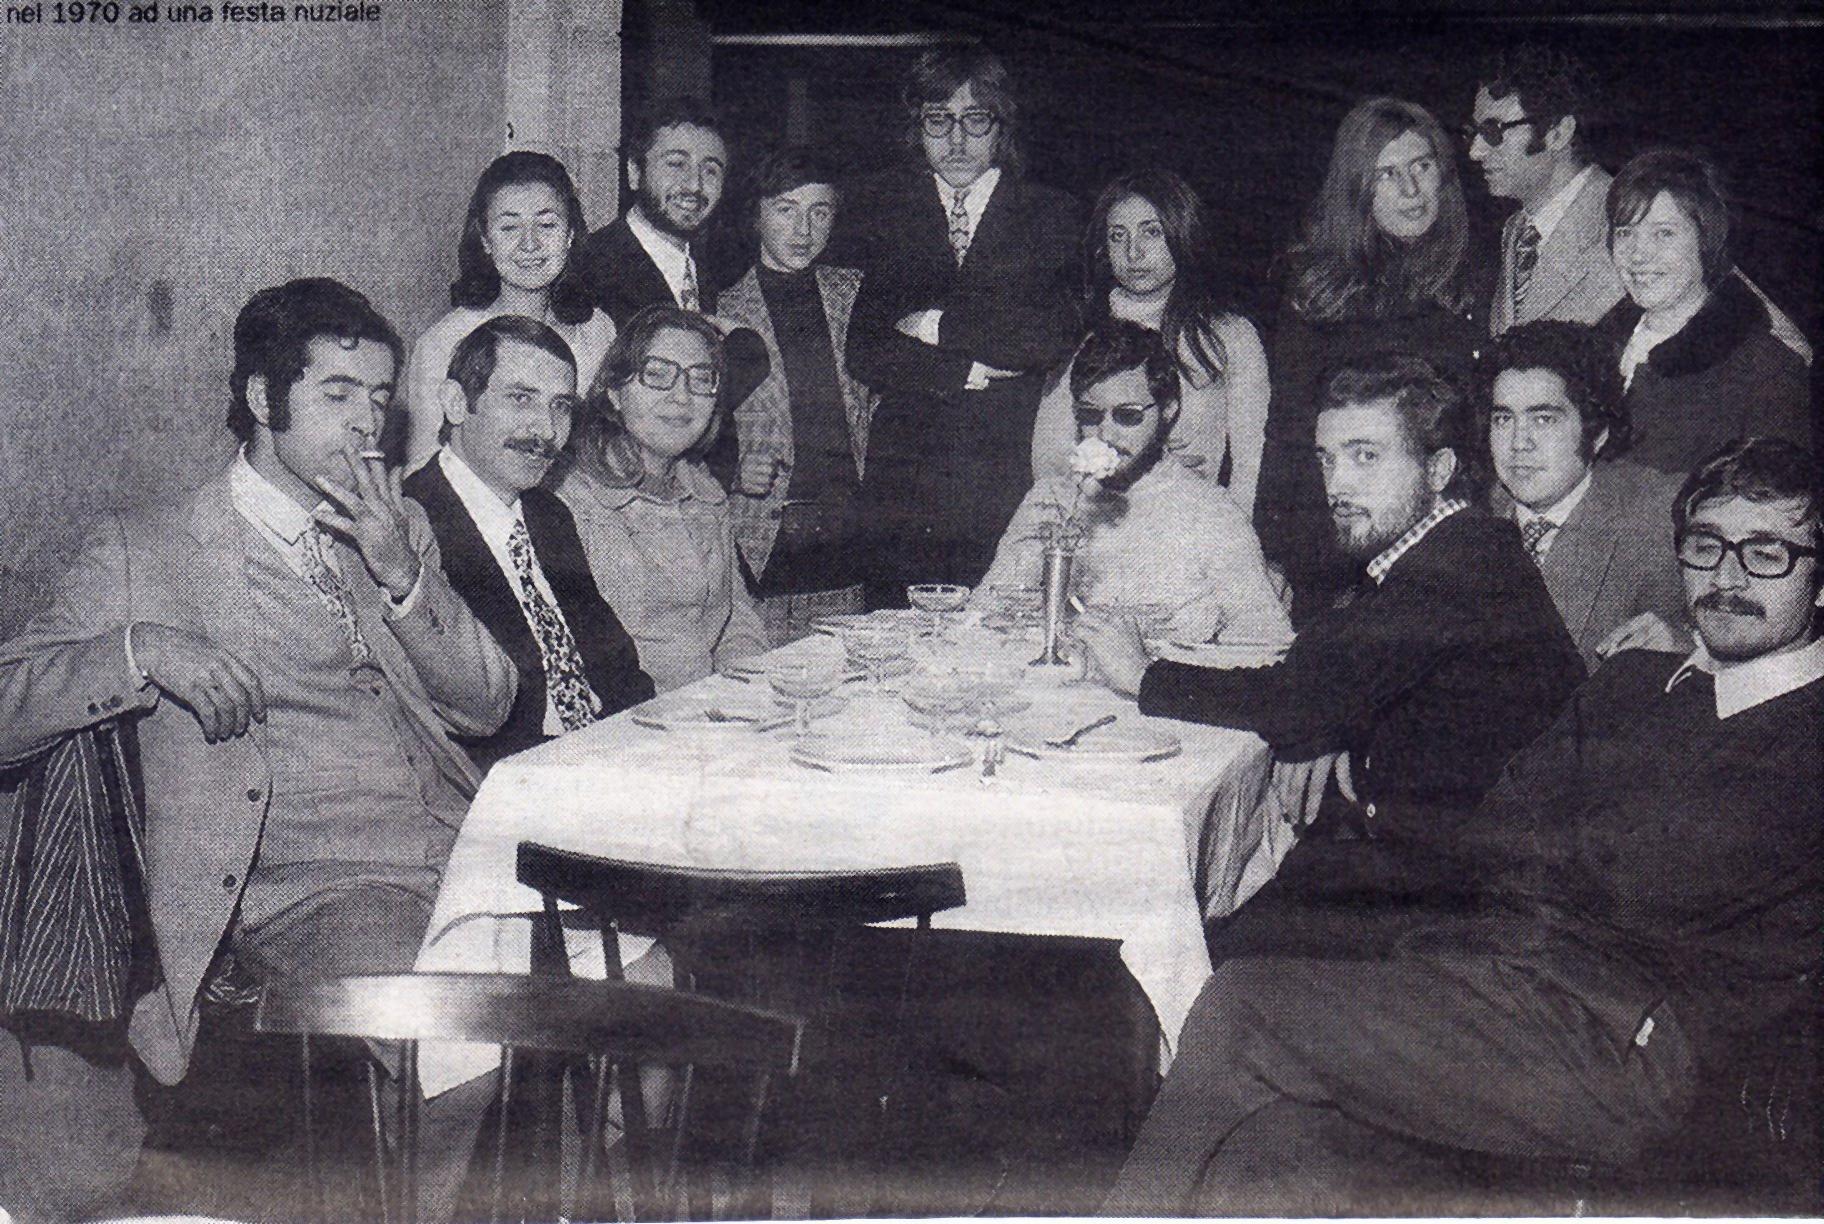 171 Matrimonio Lo Leggio 1970 File0002 ok